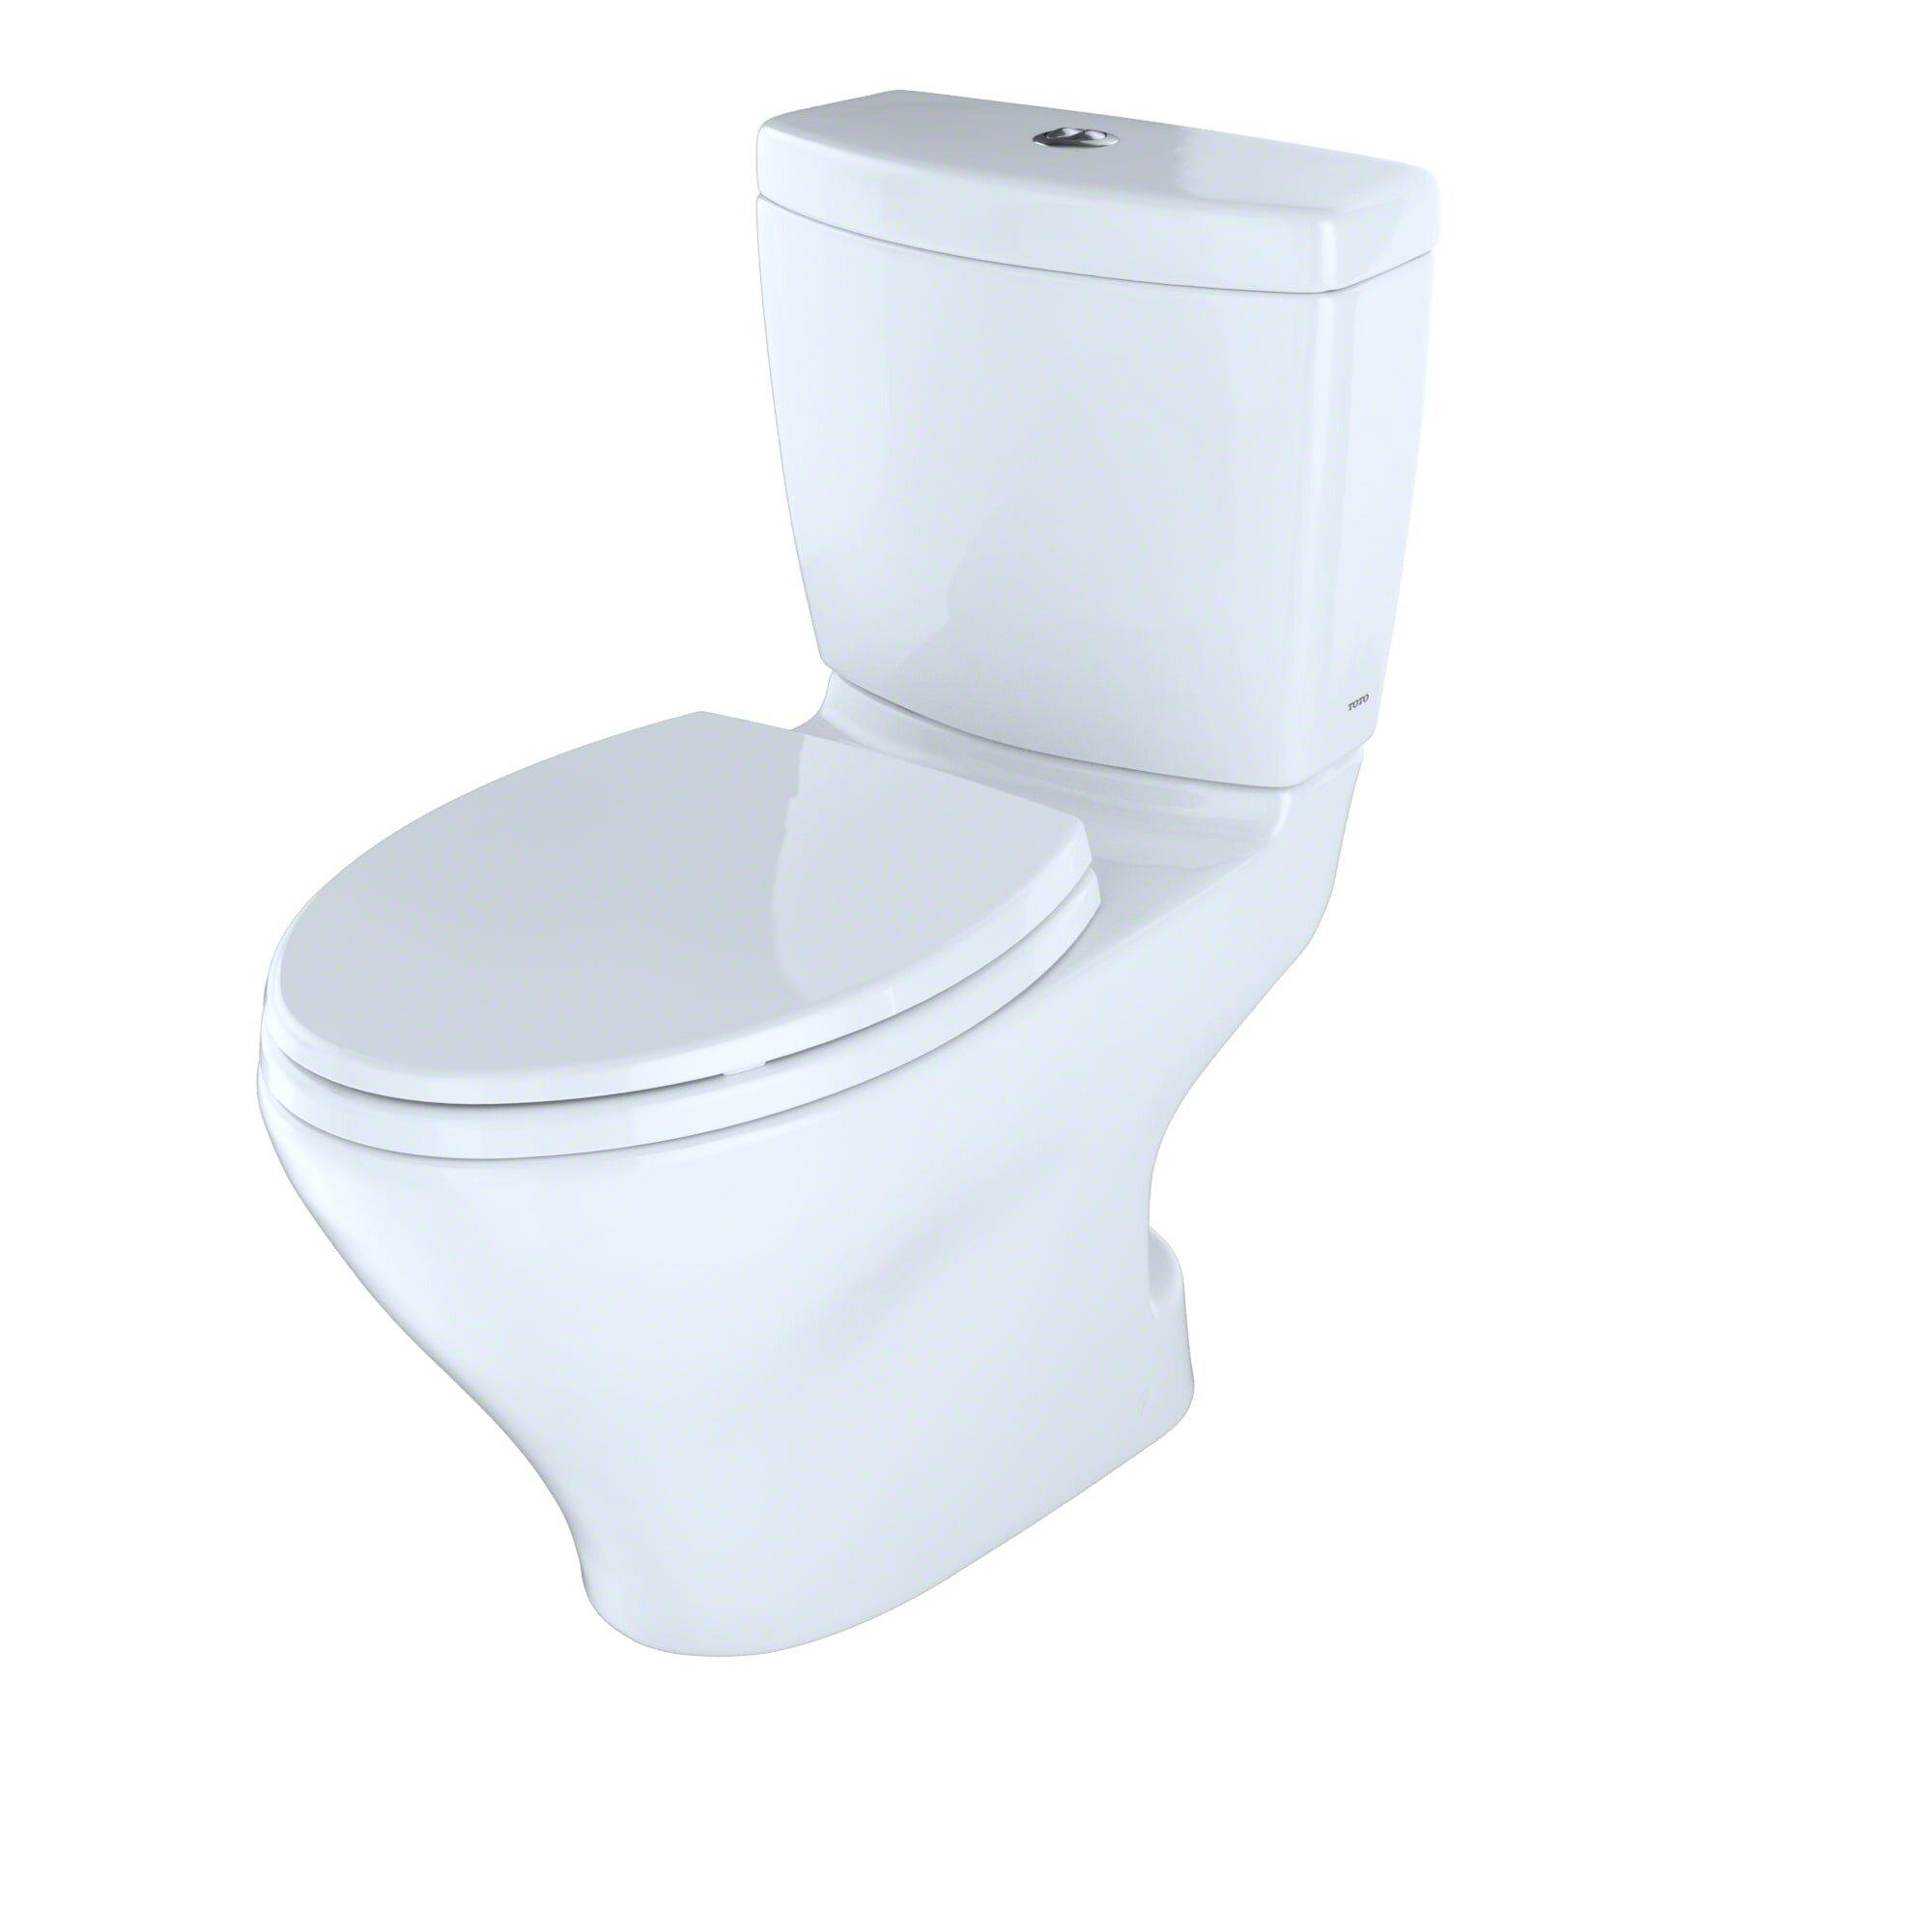 Toto Aquia Ii Dual Flush Toilet